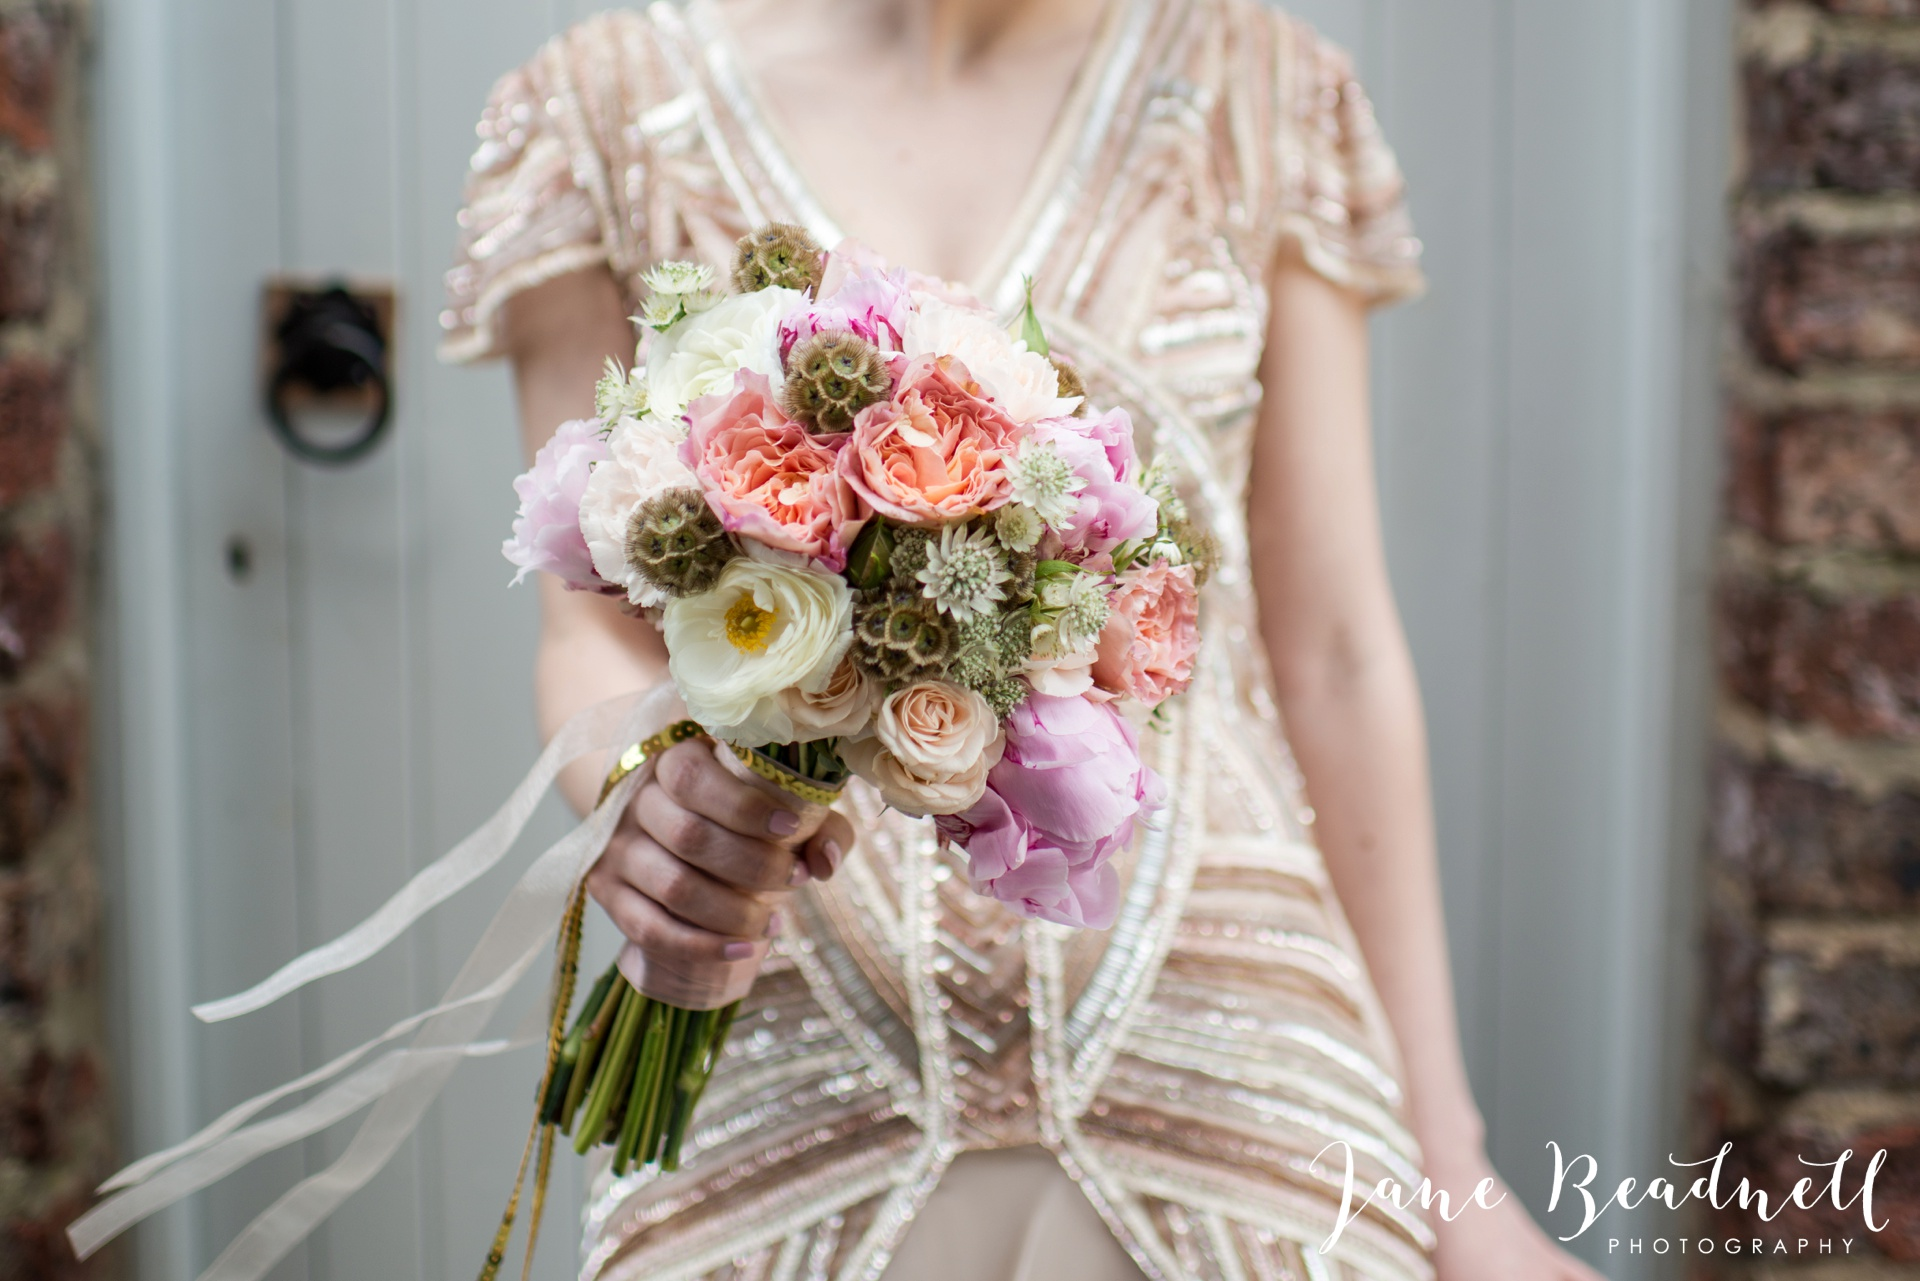 Jane Beadnell fine art wedding photographer York Bridal Photo Shoot_0003